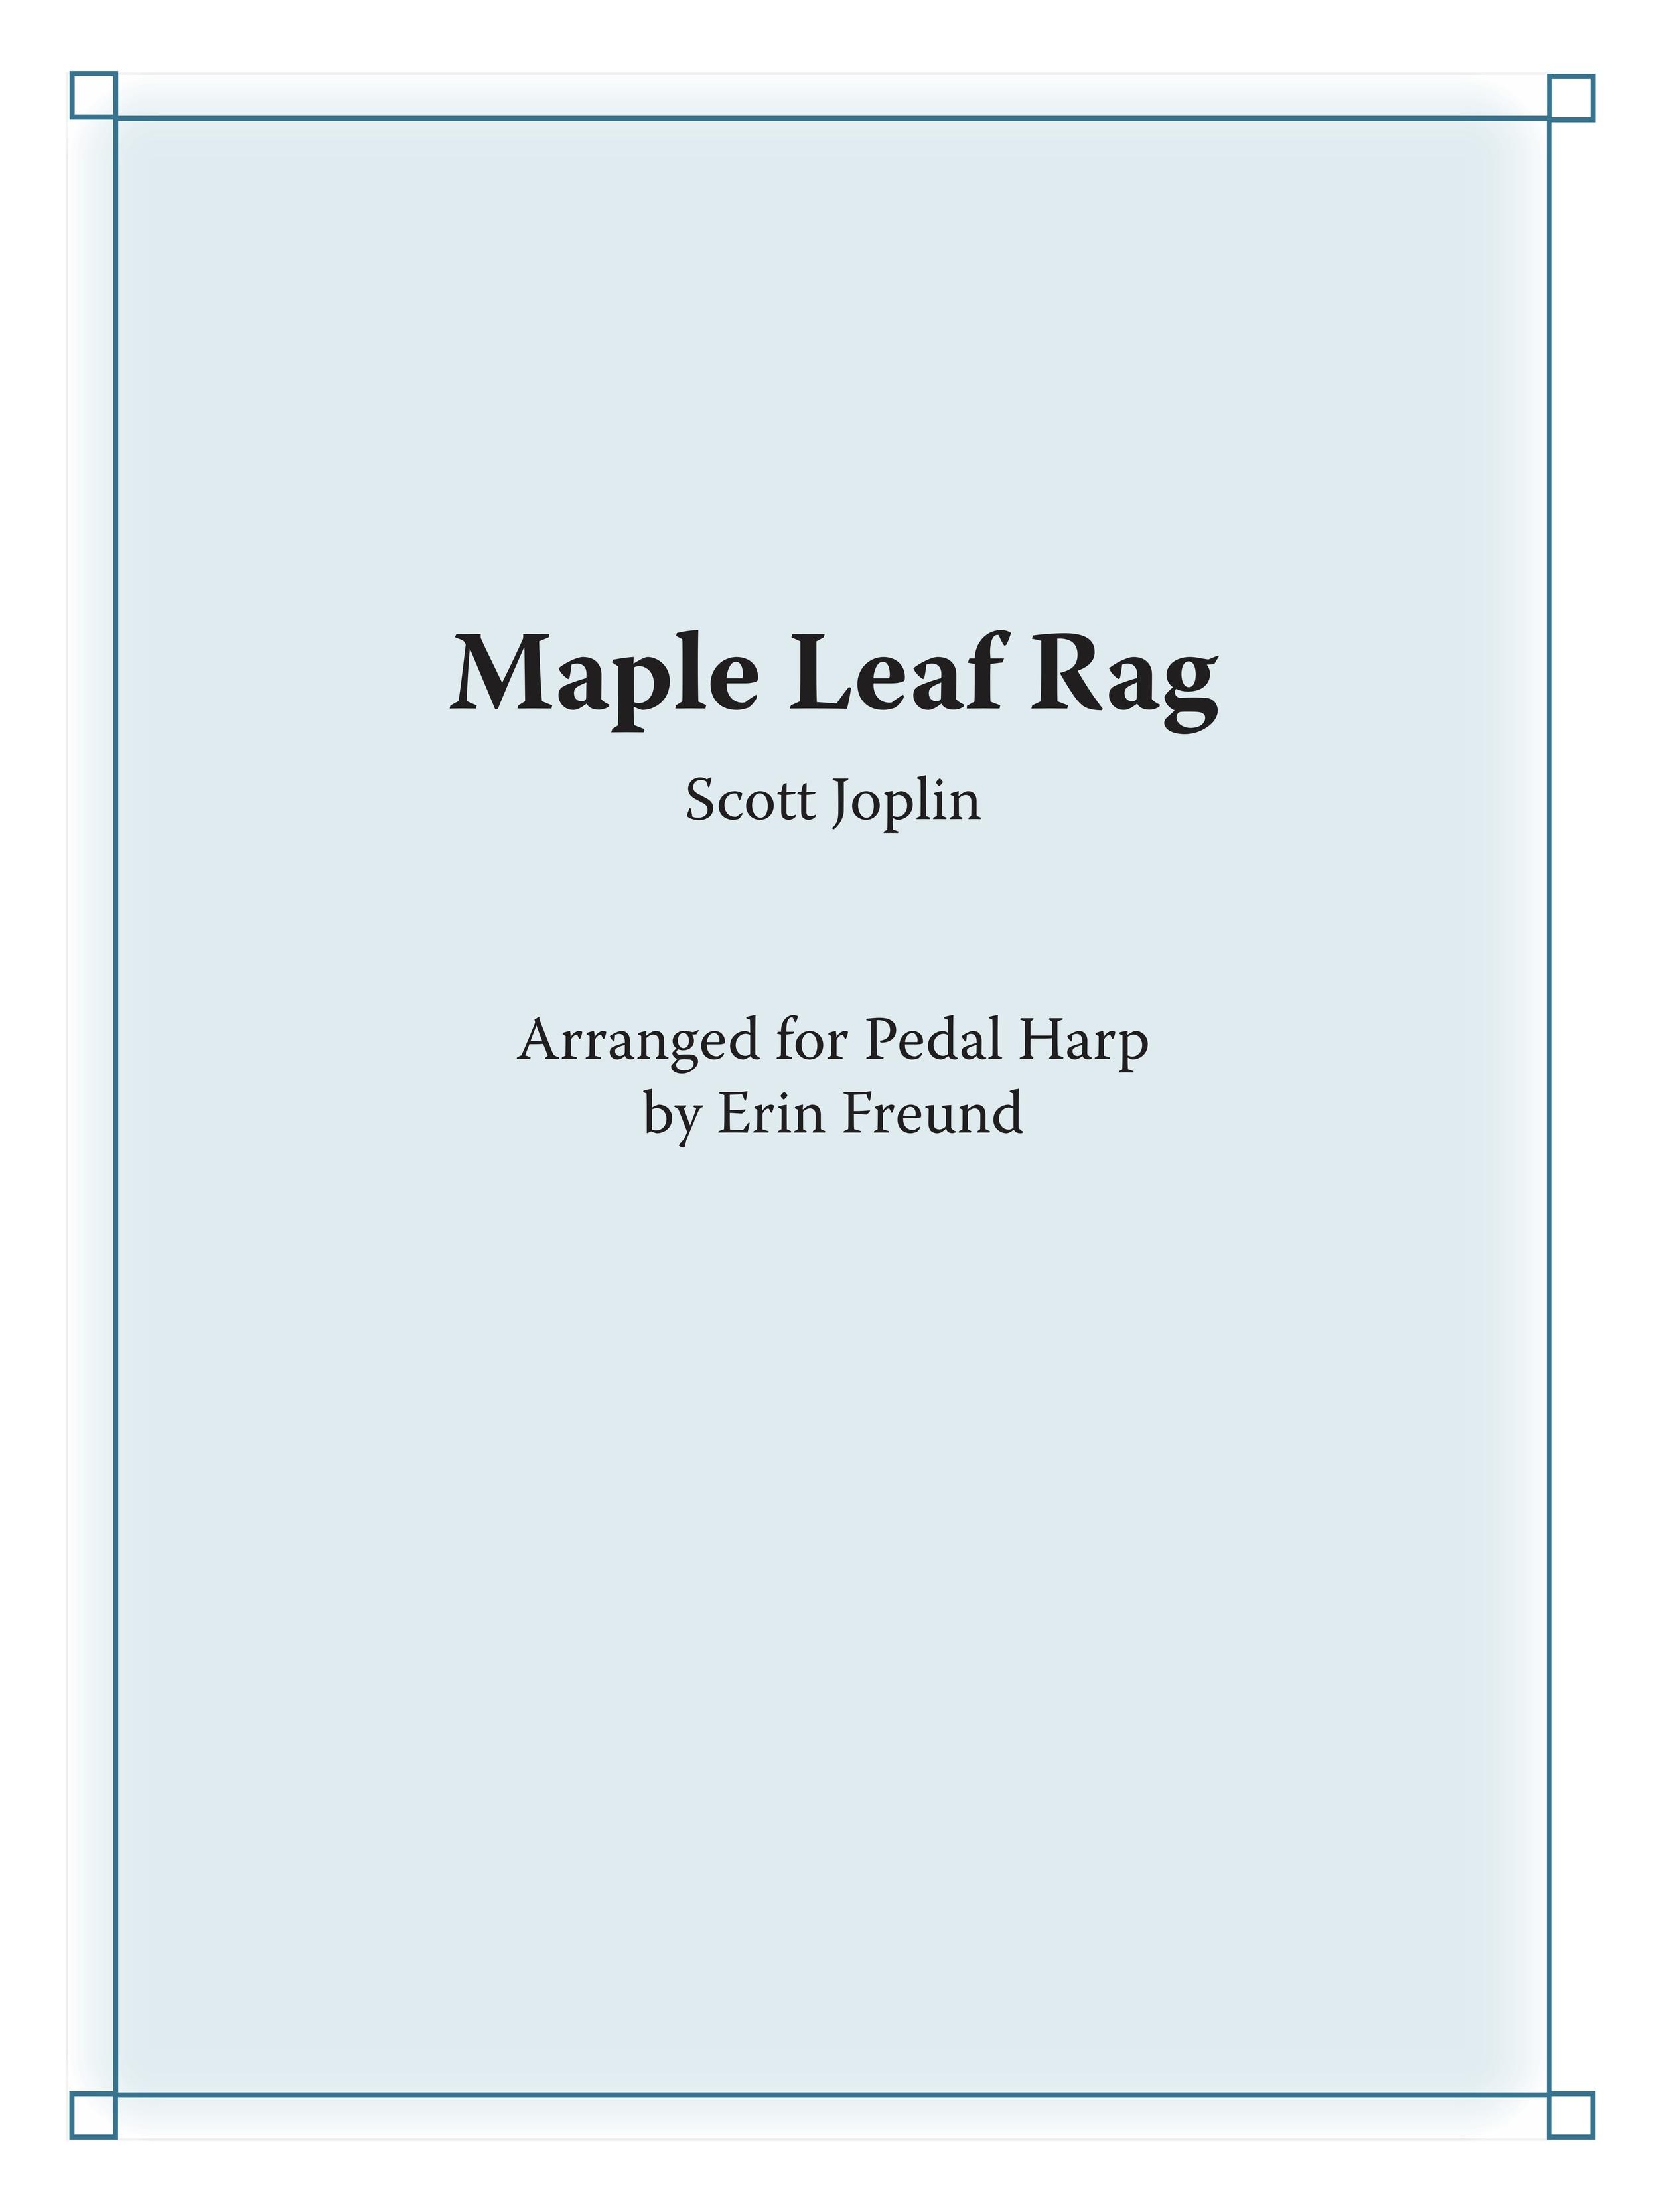 Maple Leaf Rag cover.jpg